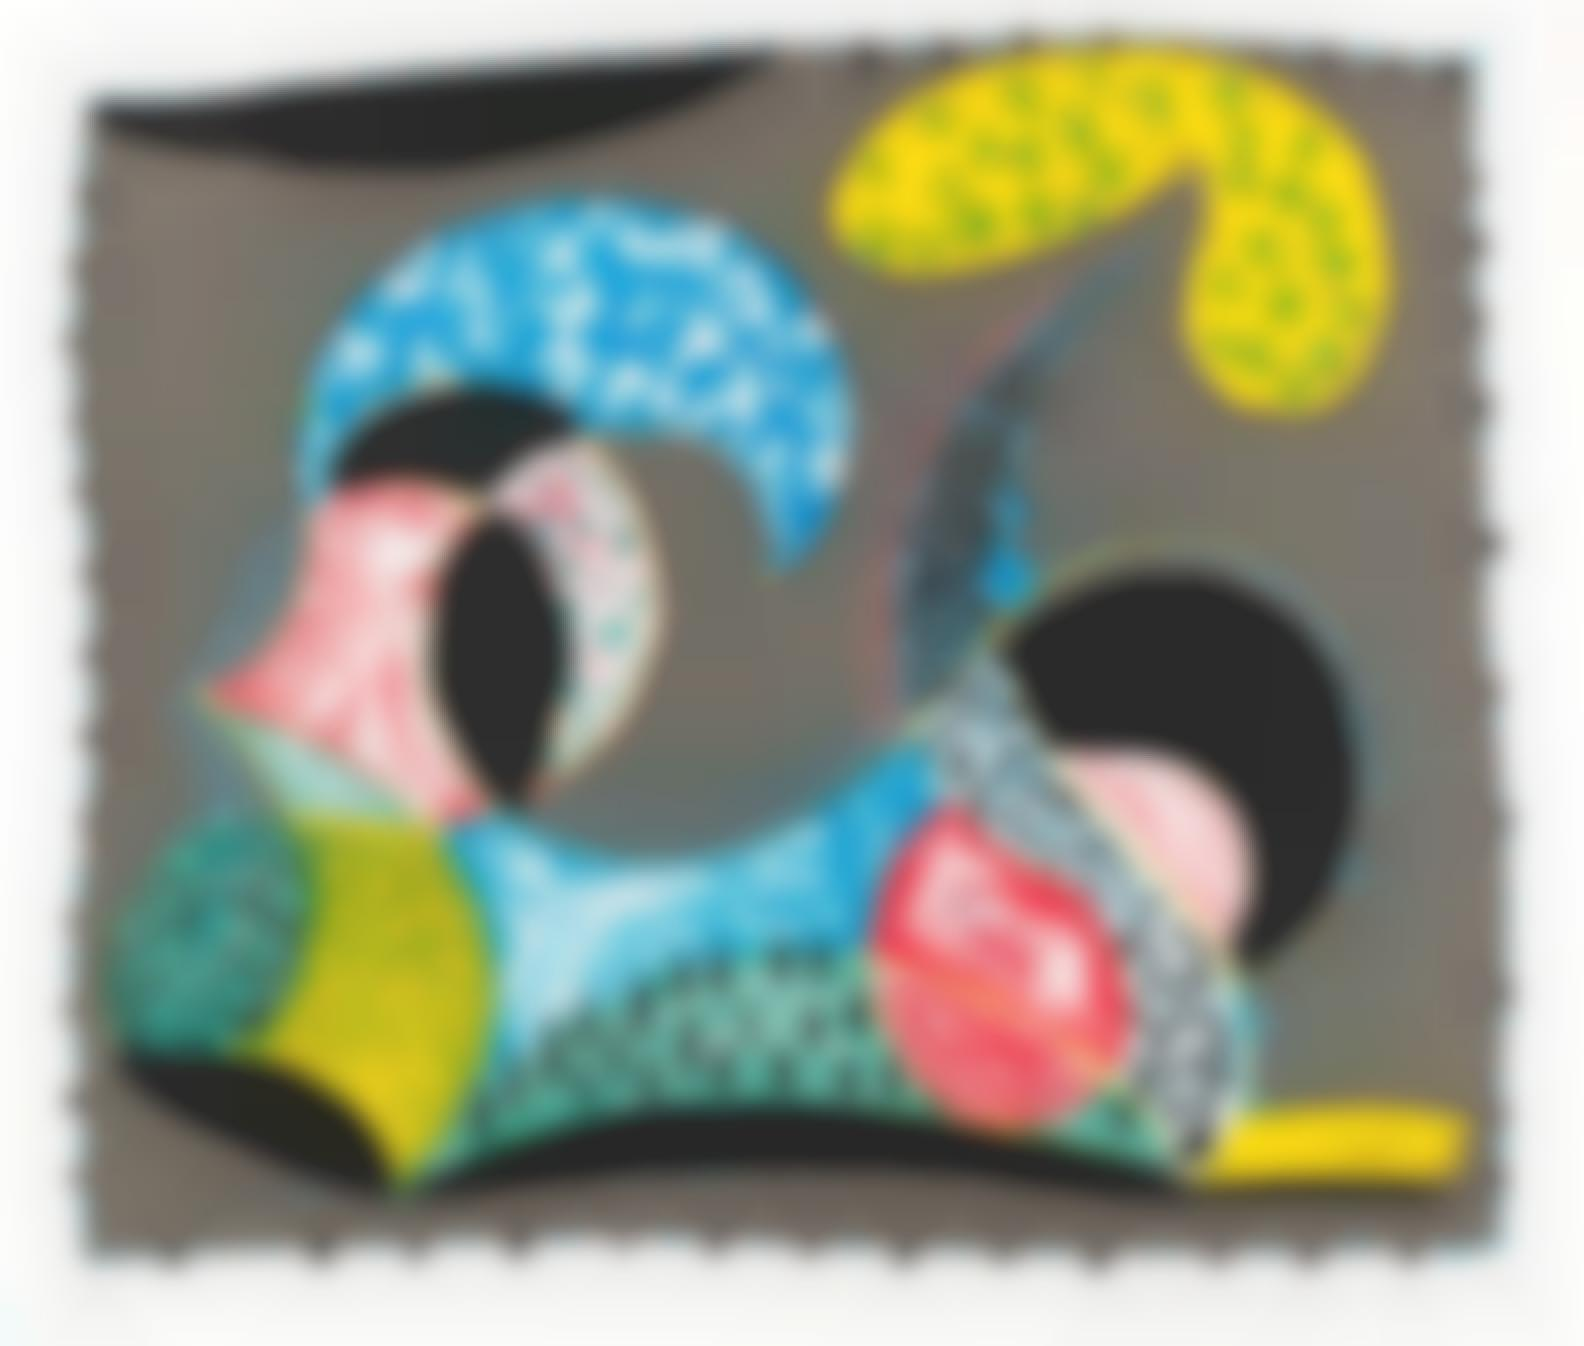 David Hockney-Warm Start, From Some New Prints (Mca Tokyo 337)-1993